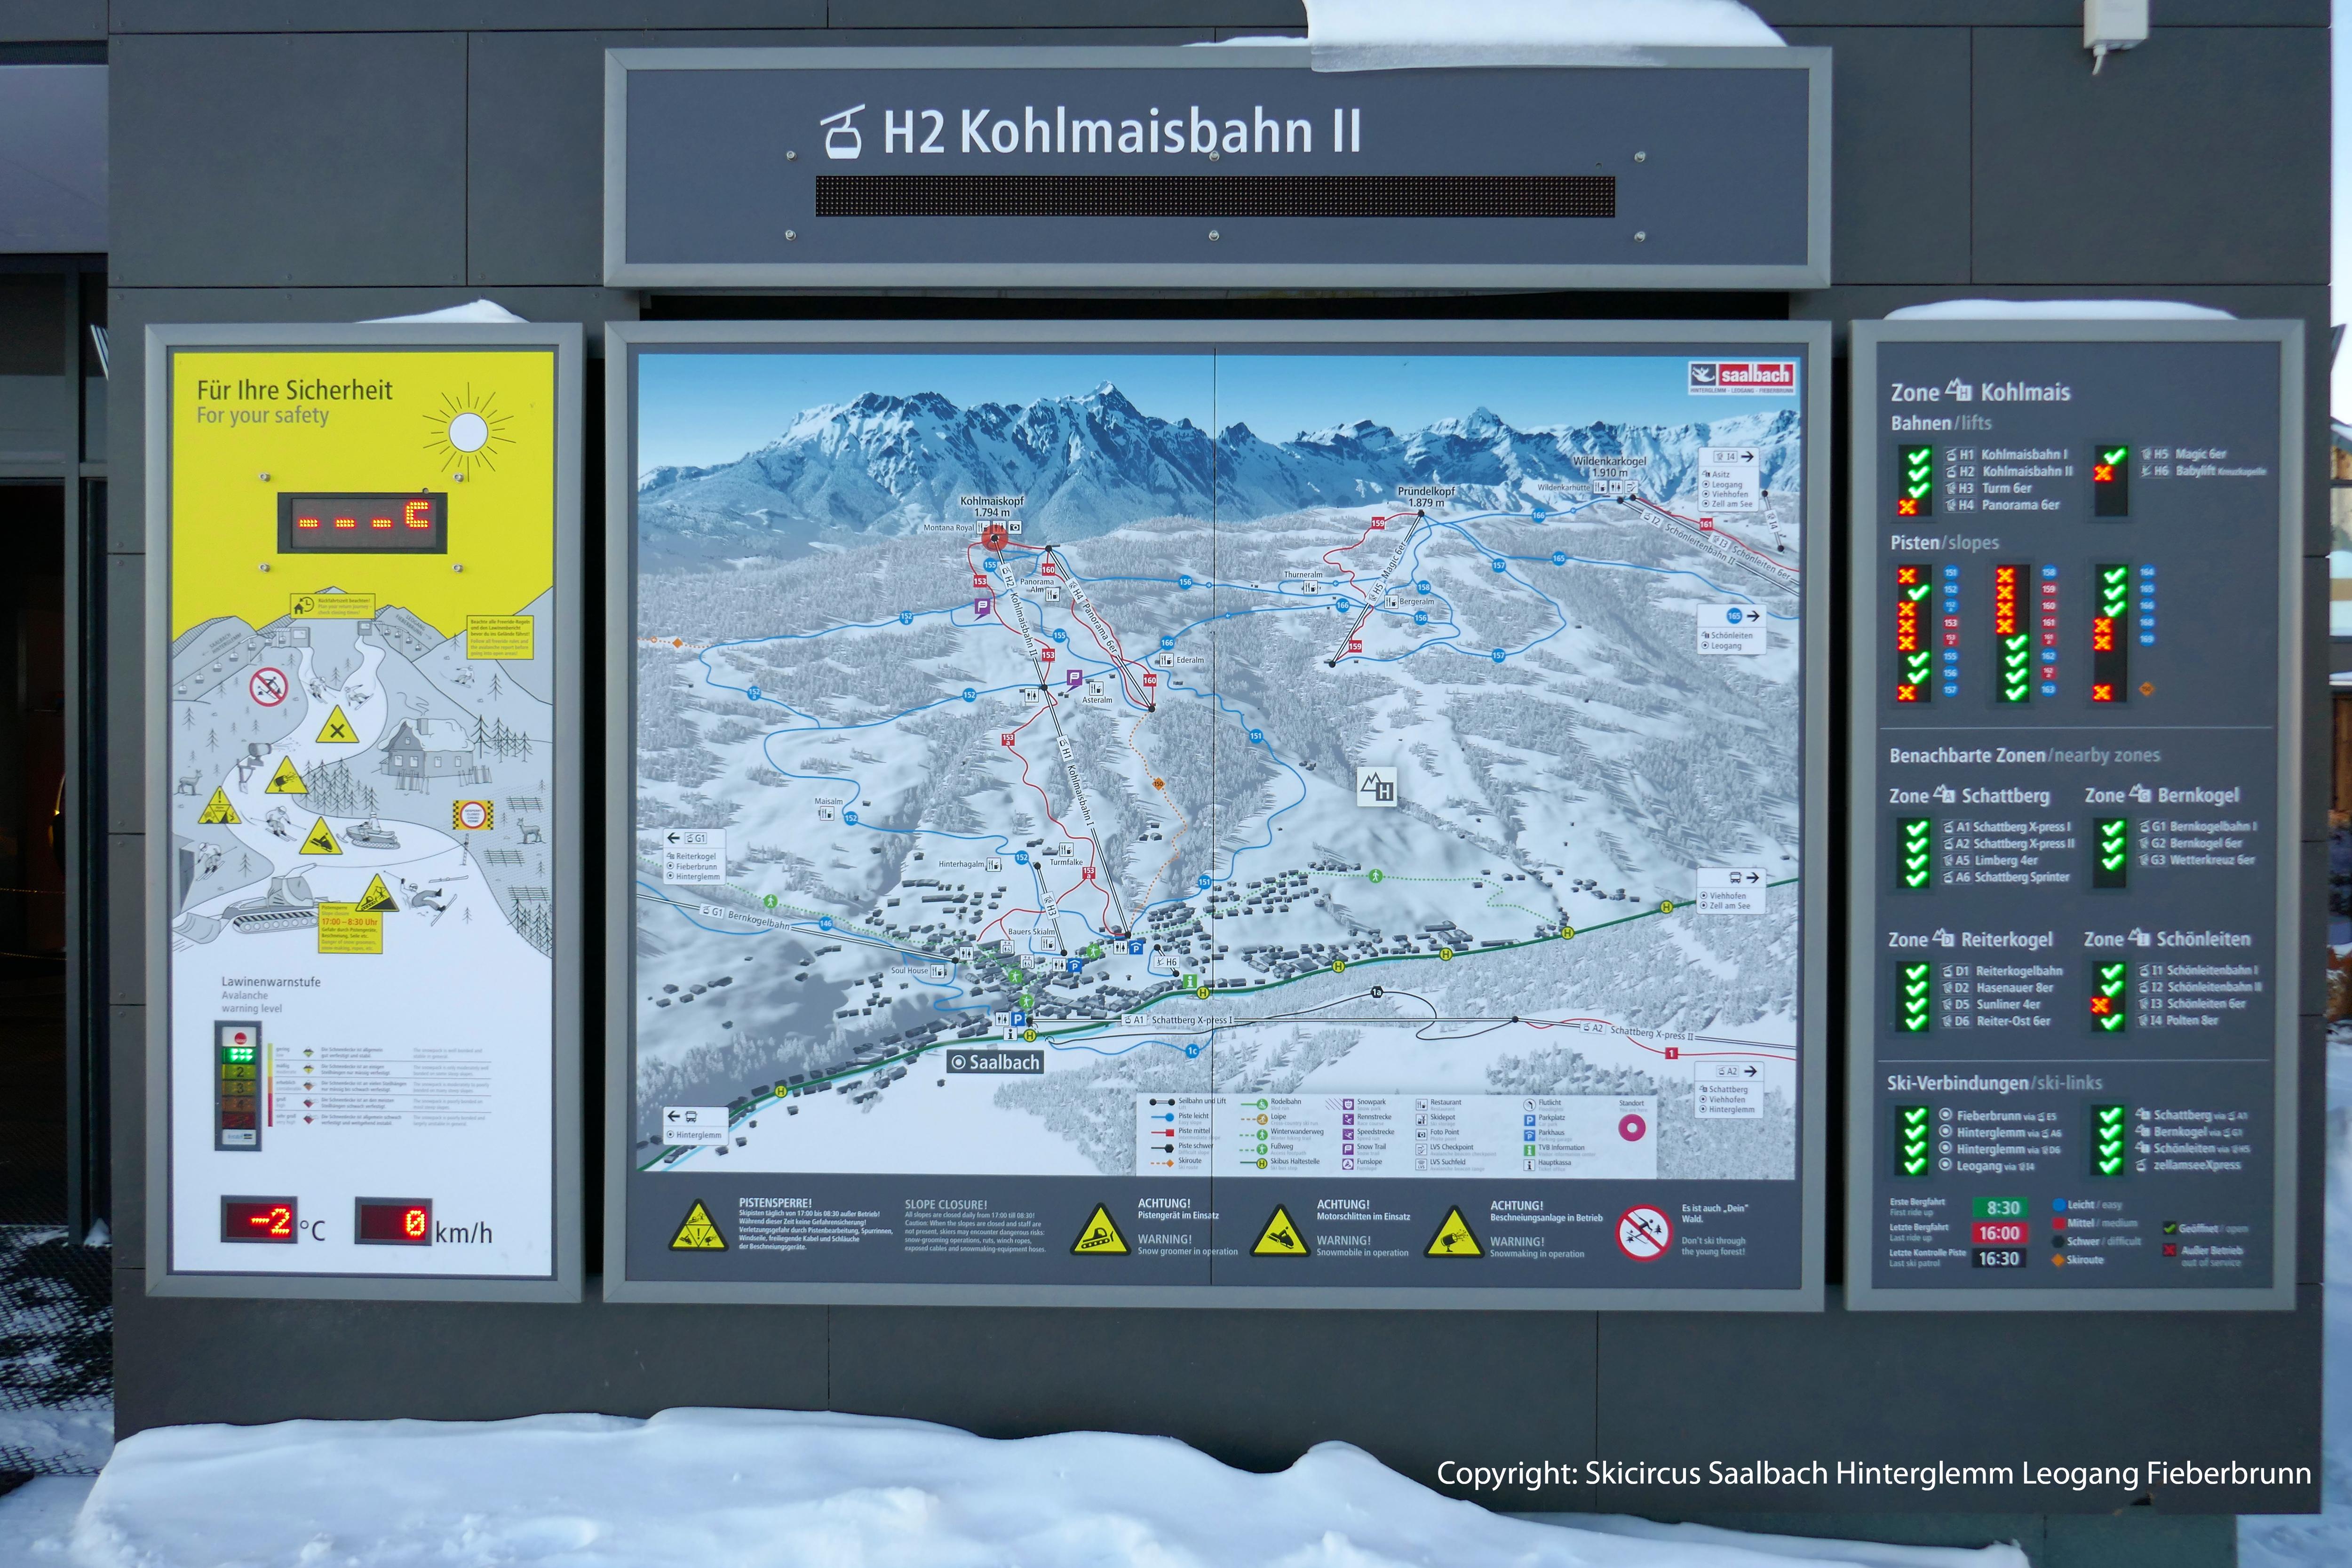 3D Panoramakarte Panoramatafel Skicircus Saalbach Kohlmaisbahn